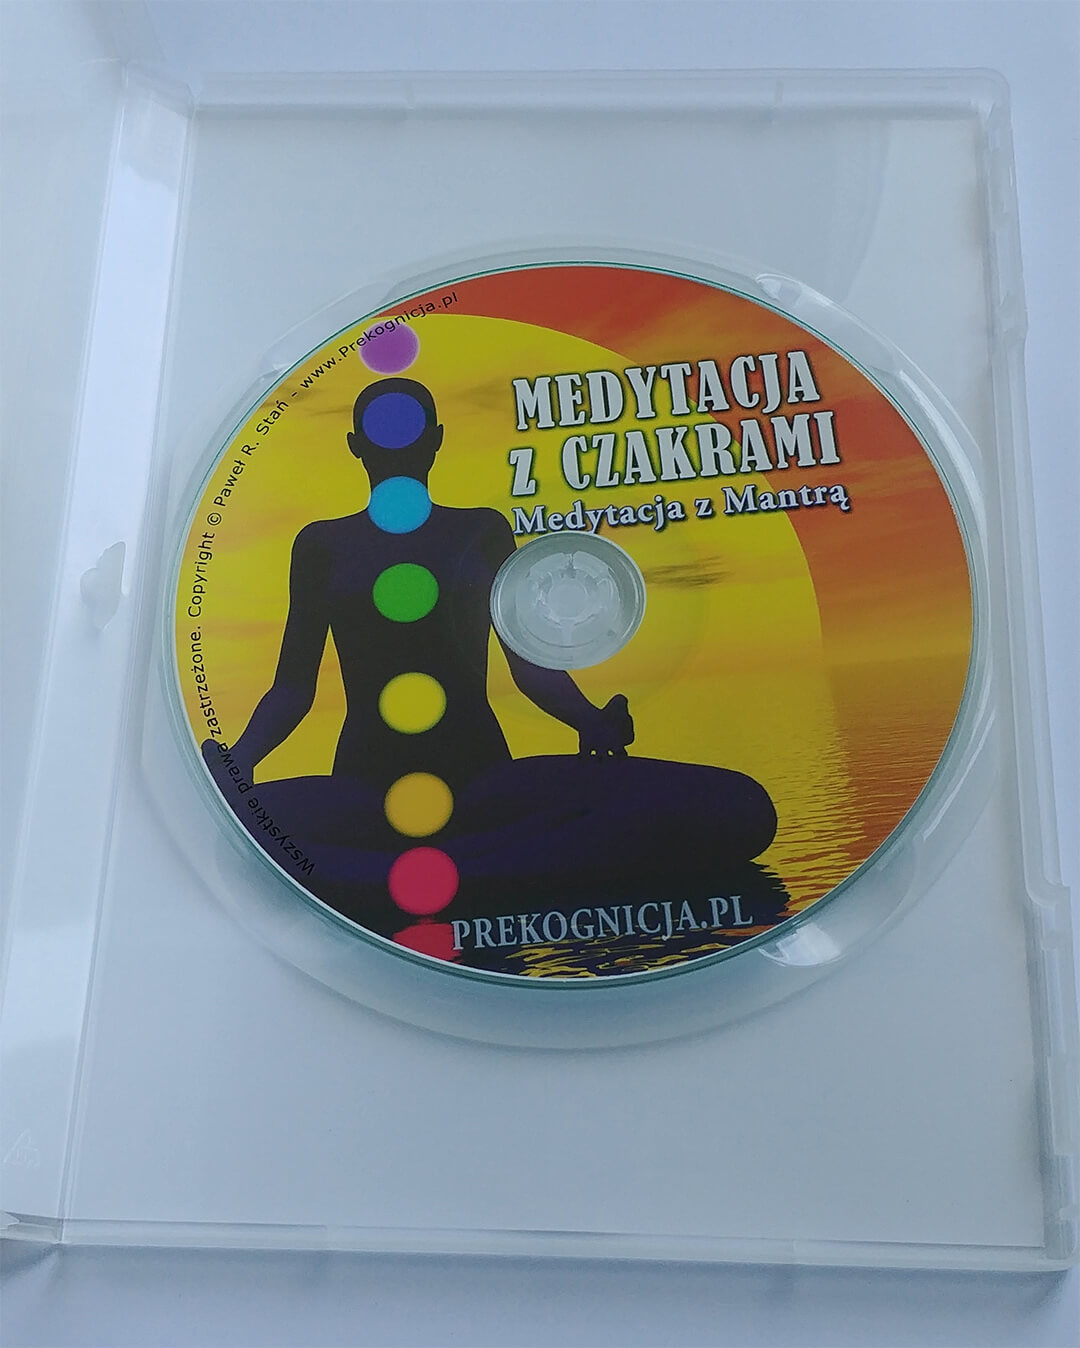 czakry medytacja - Komplet medytacji do pracy z czakrami